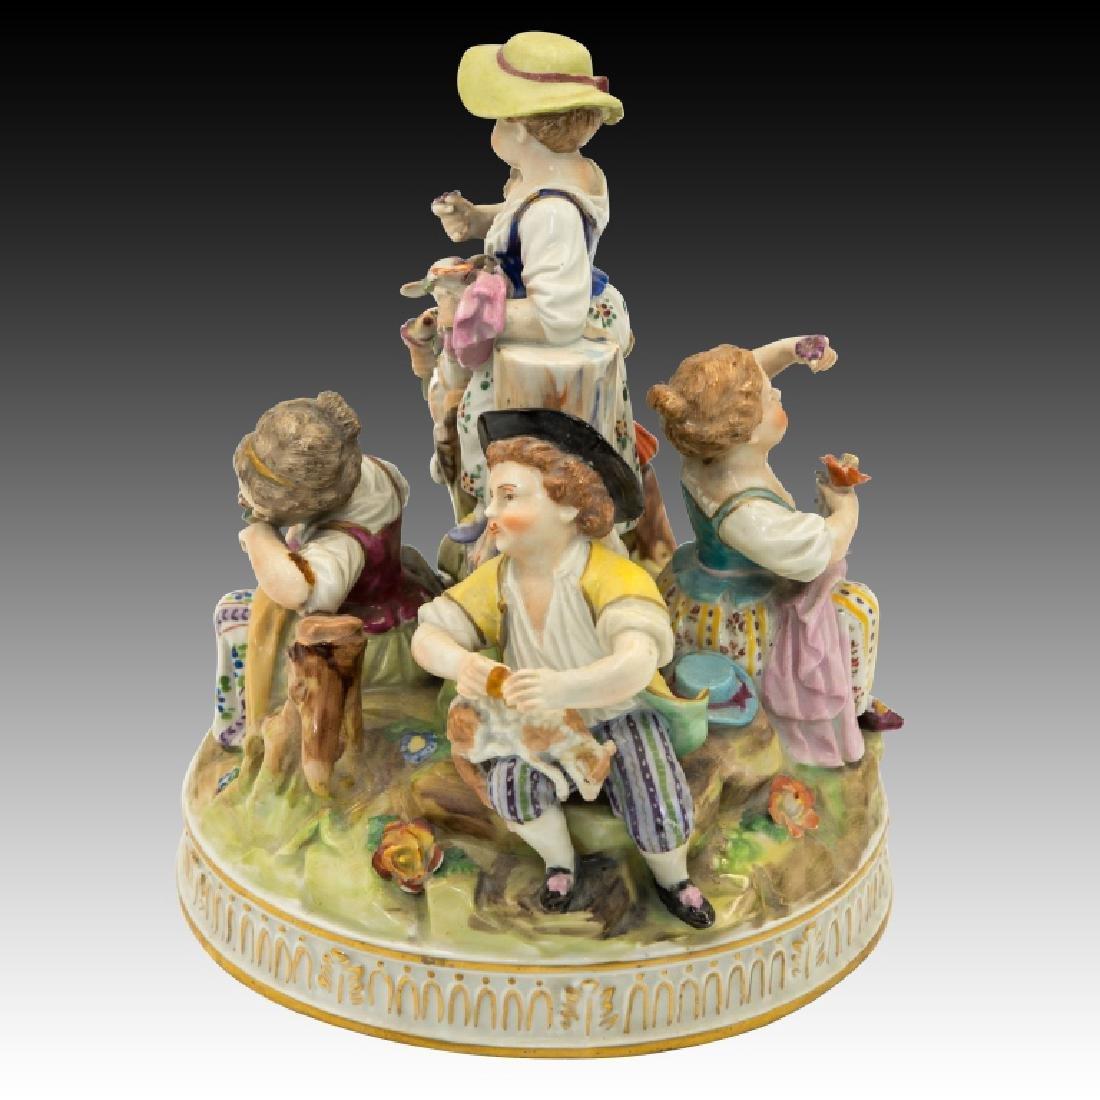 Dresden Figurine Group of  5 Children - 2